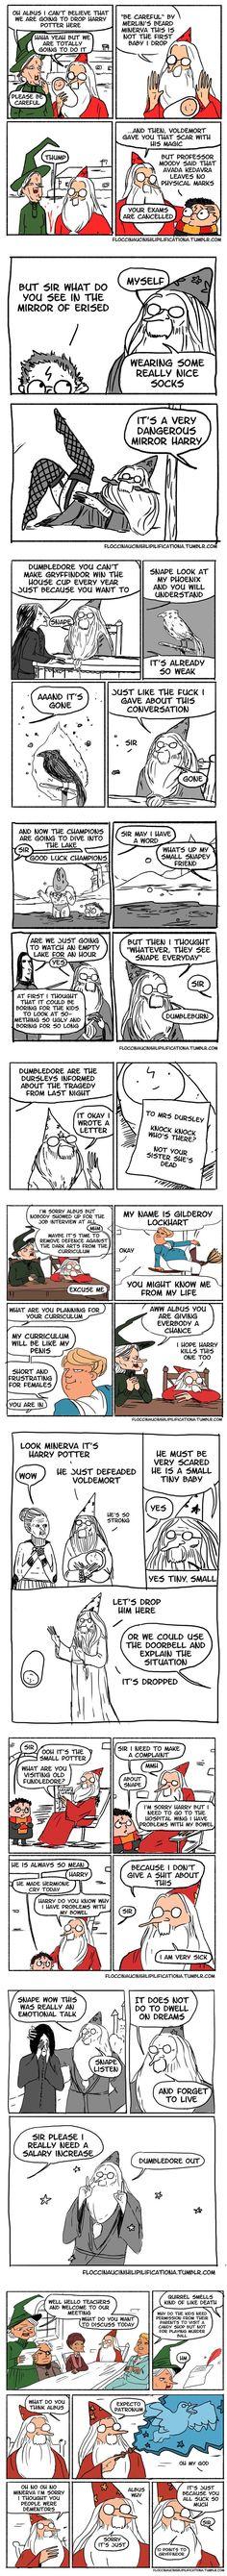 "10+ Funny ""Harry Potter"" Comics Reveal How Irresponsible Dumbledore Was"